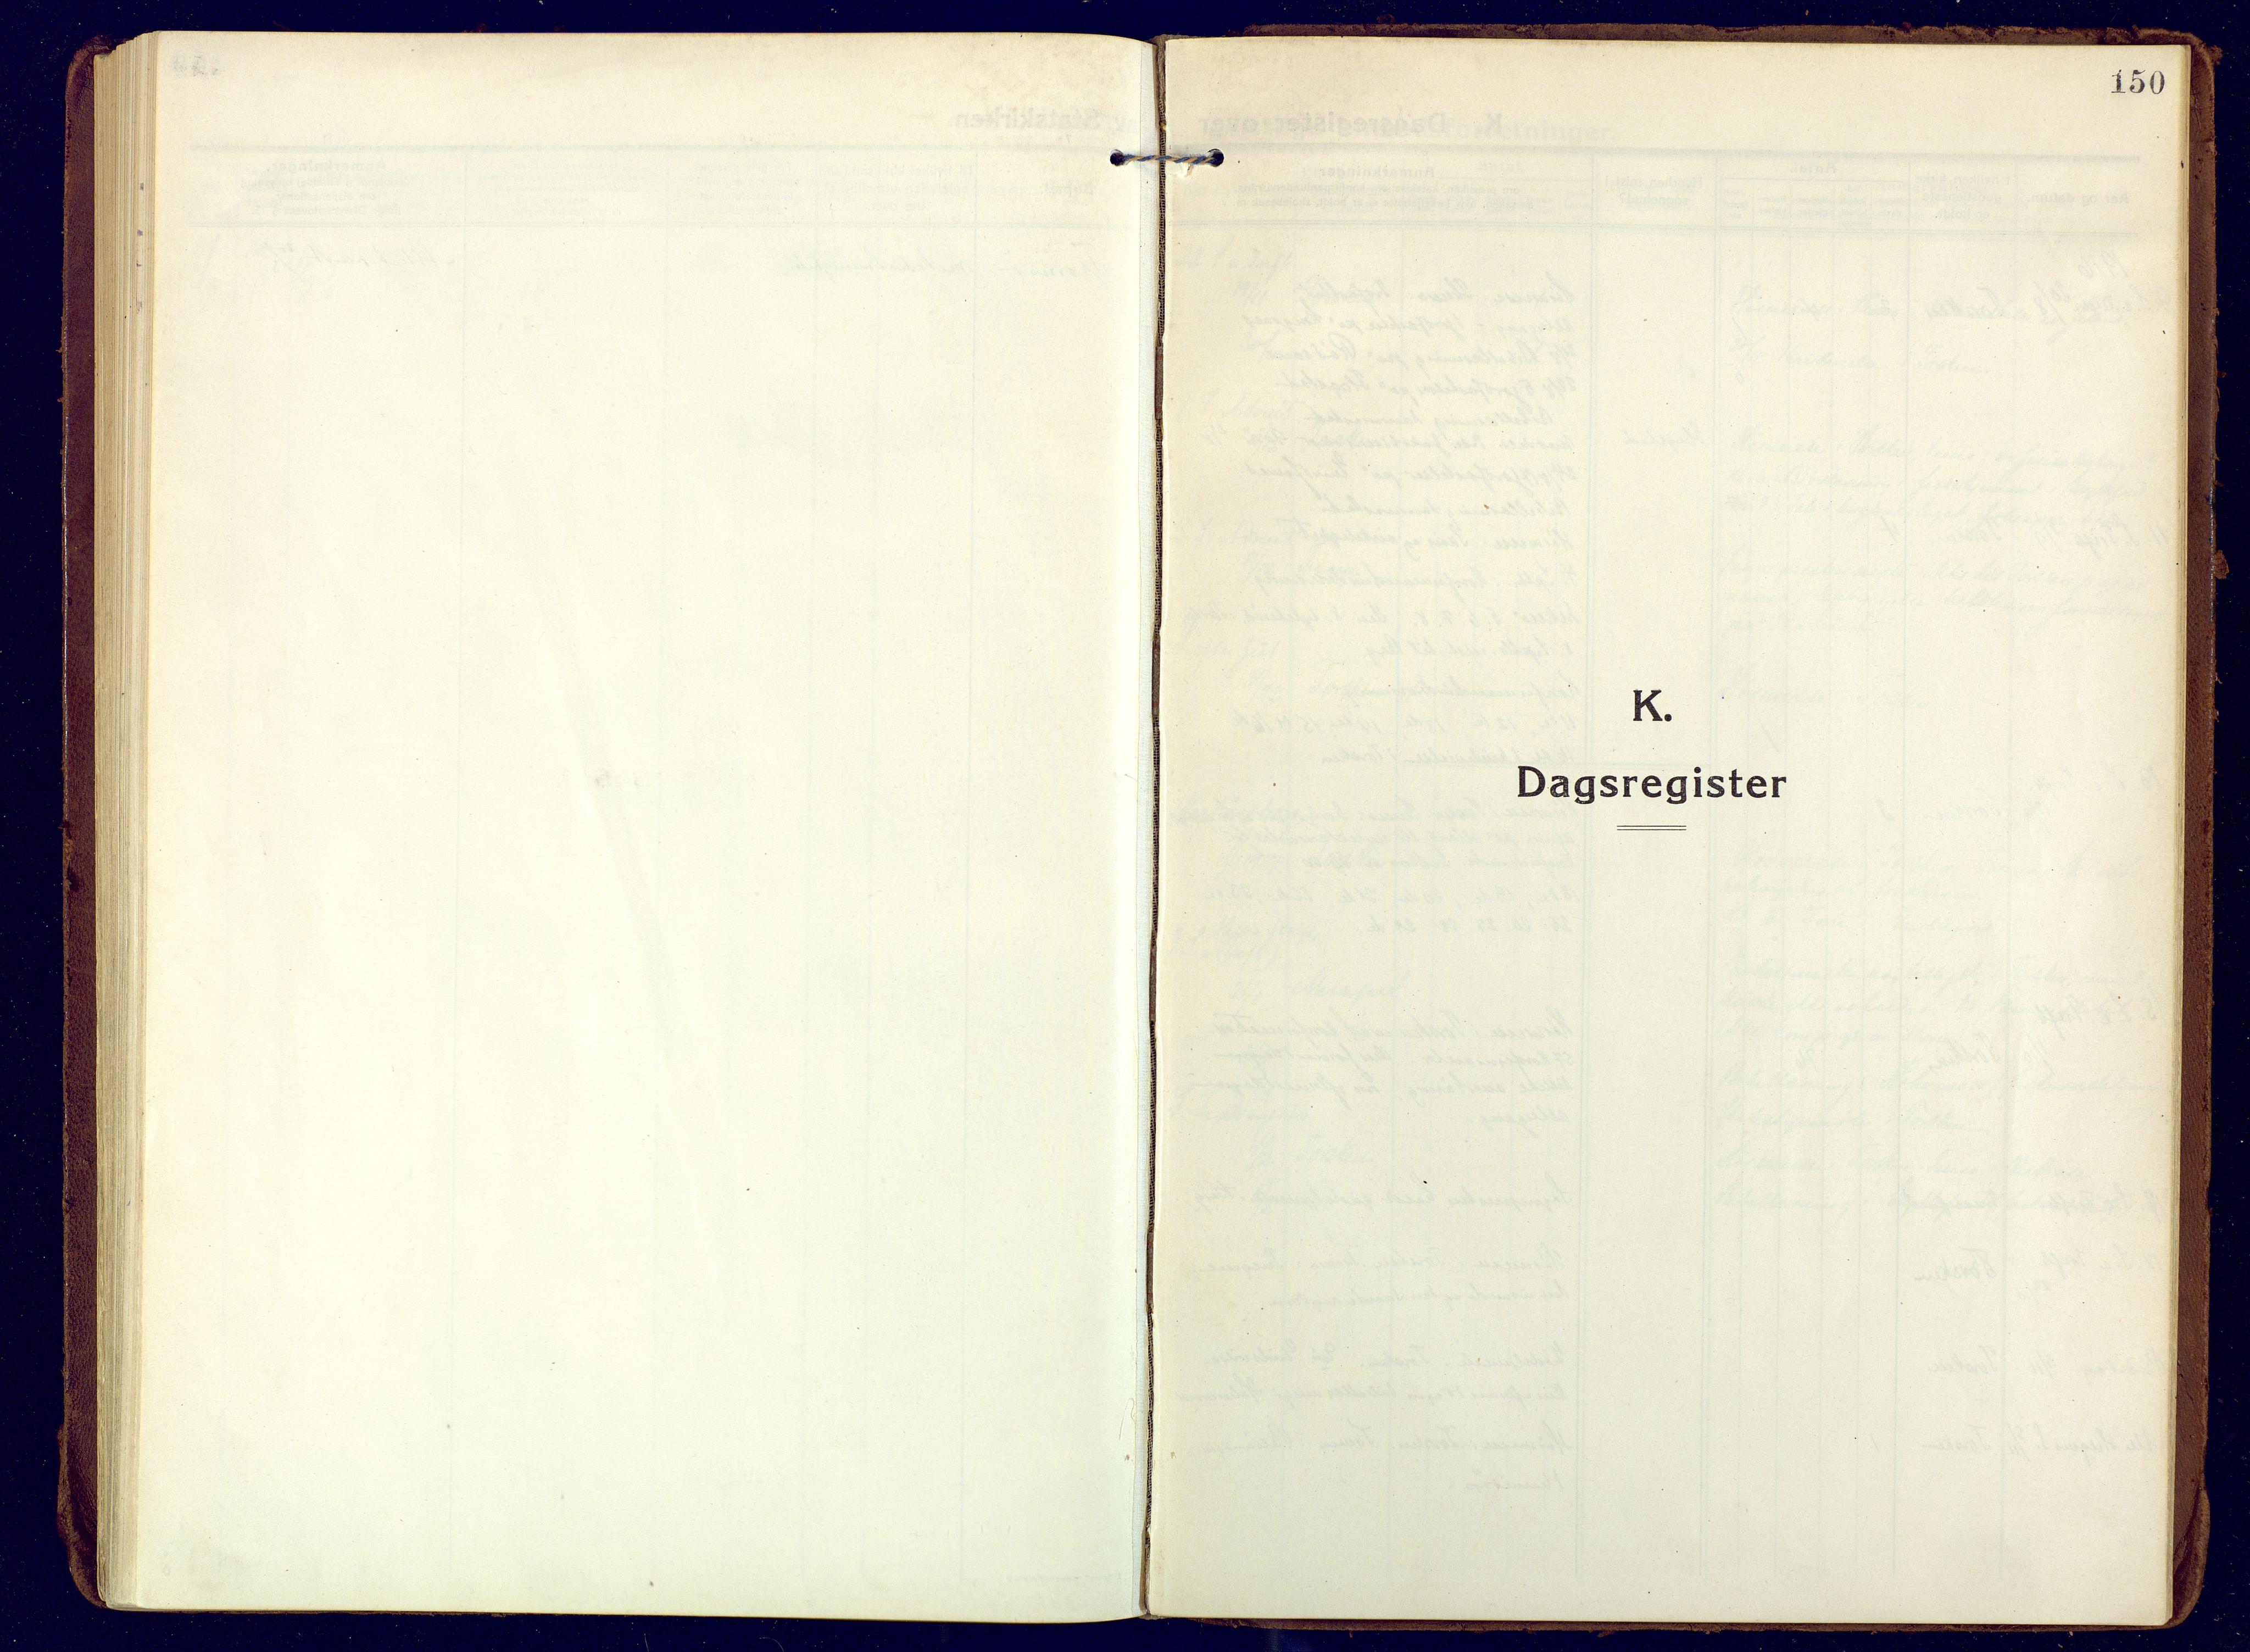 SATØ, Mefjord/Berg sokneprestkontor, G/Ga/Gaa: Ministerialbok nr. 10, 1916-1928, s. 150